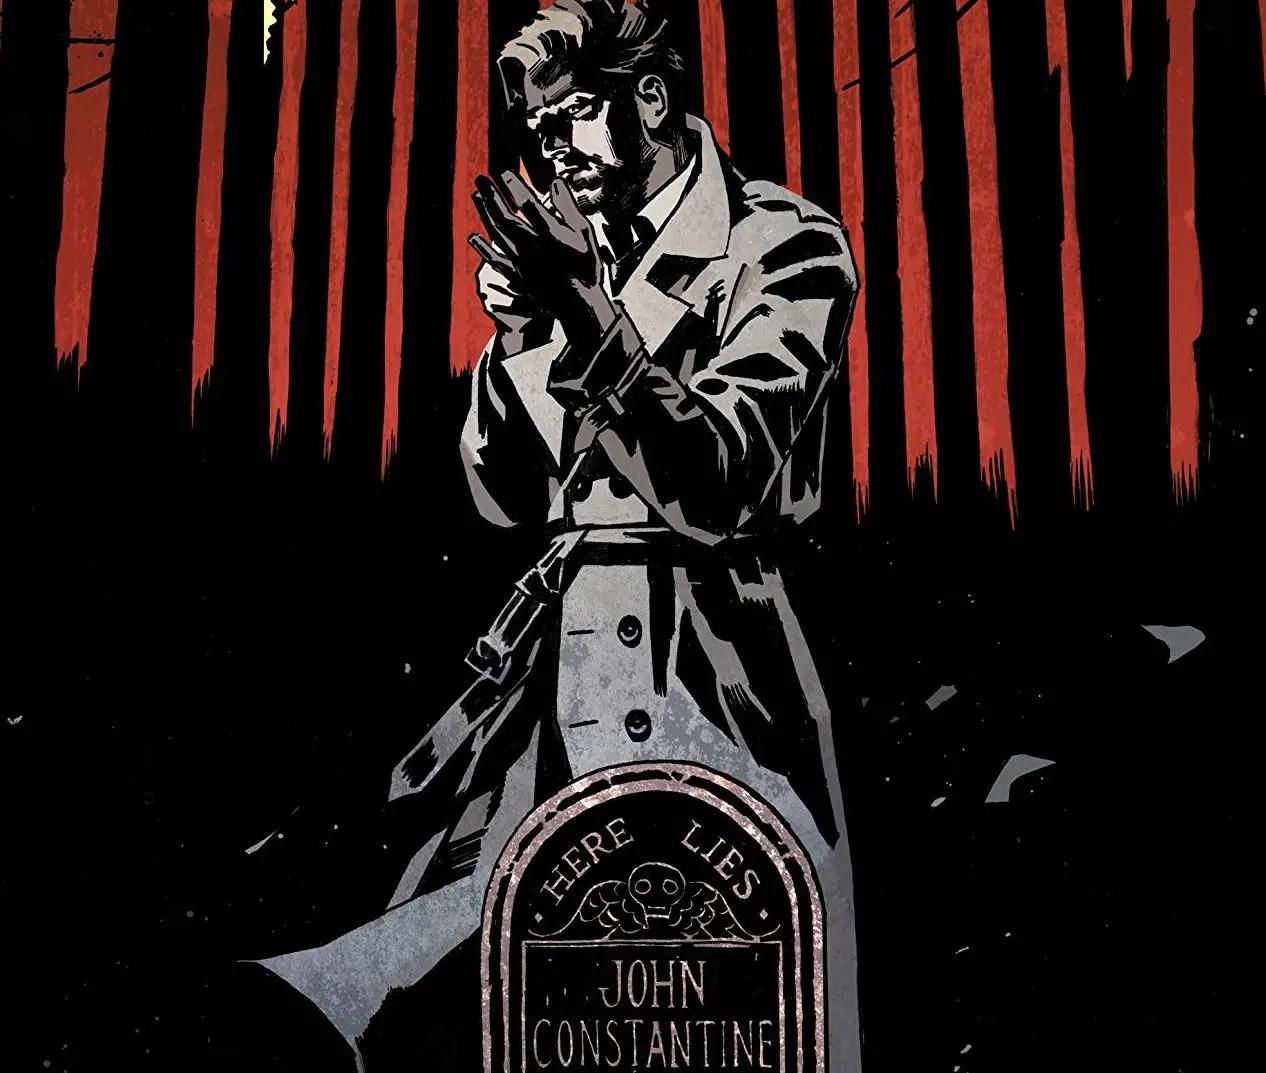 John Constantine: Hellblazer #1 review: a horrific return to form